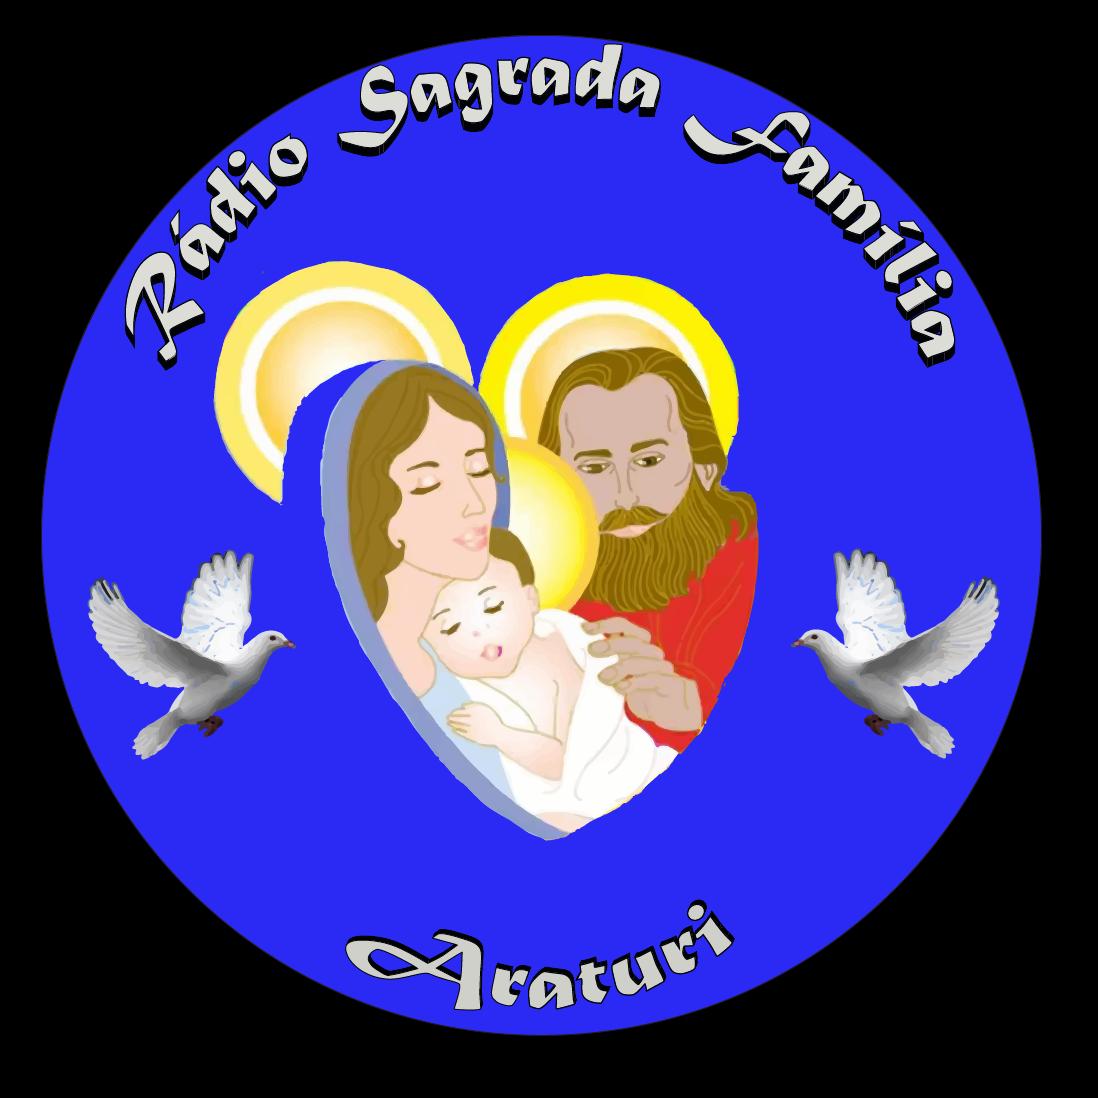 Radio Sagrada Familia do Araturi